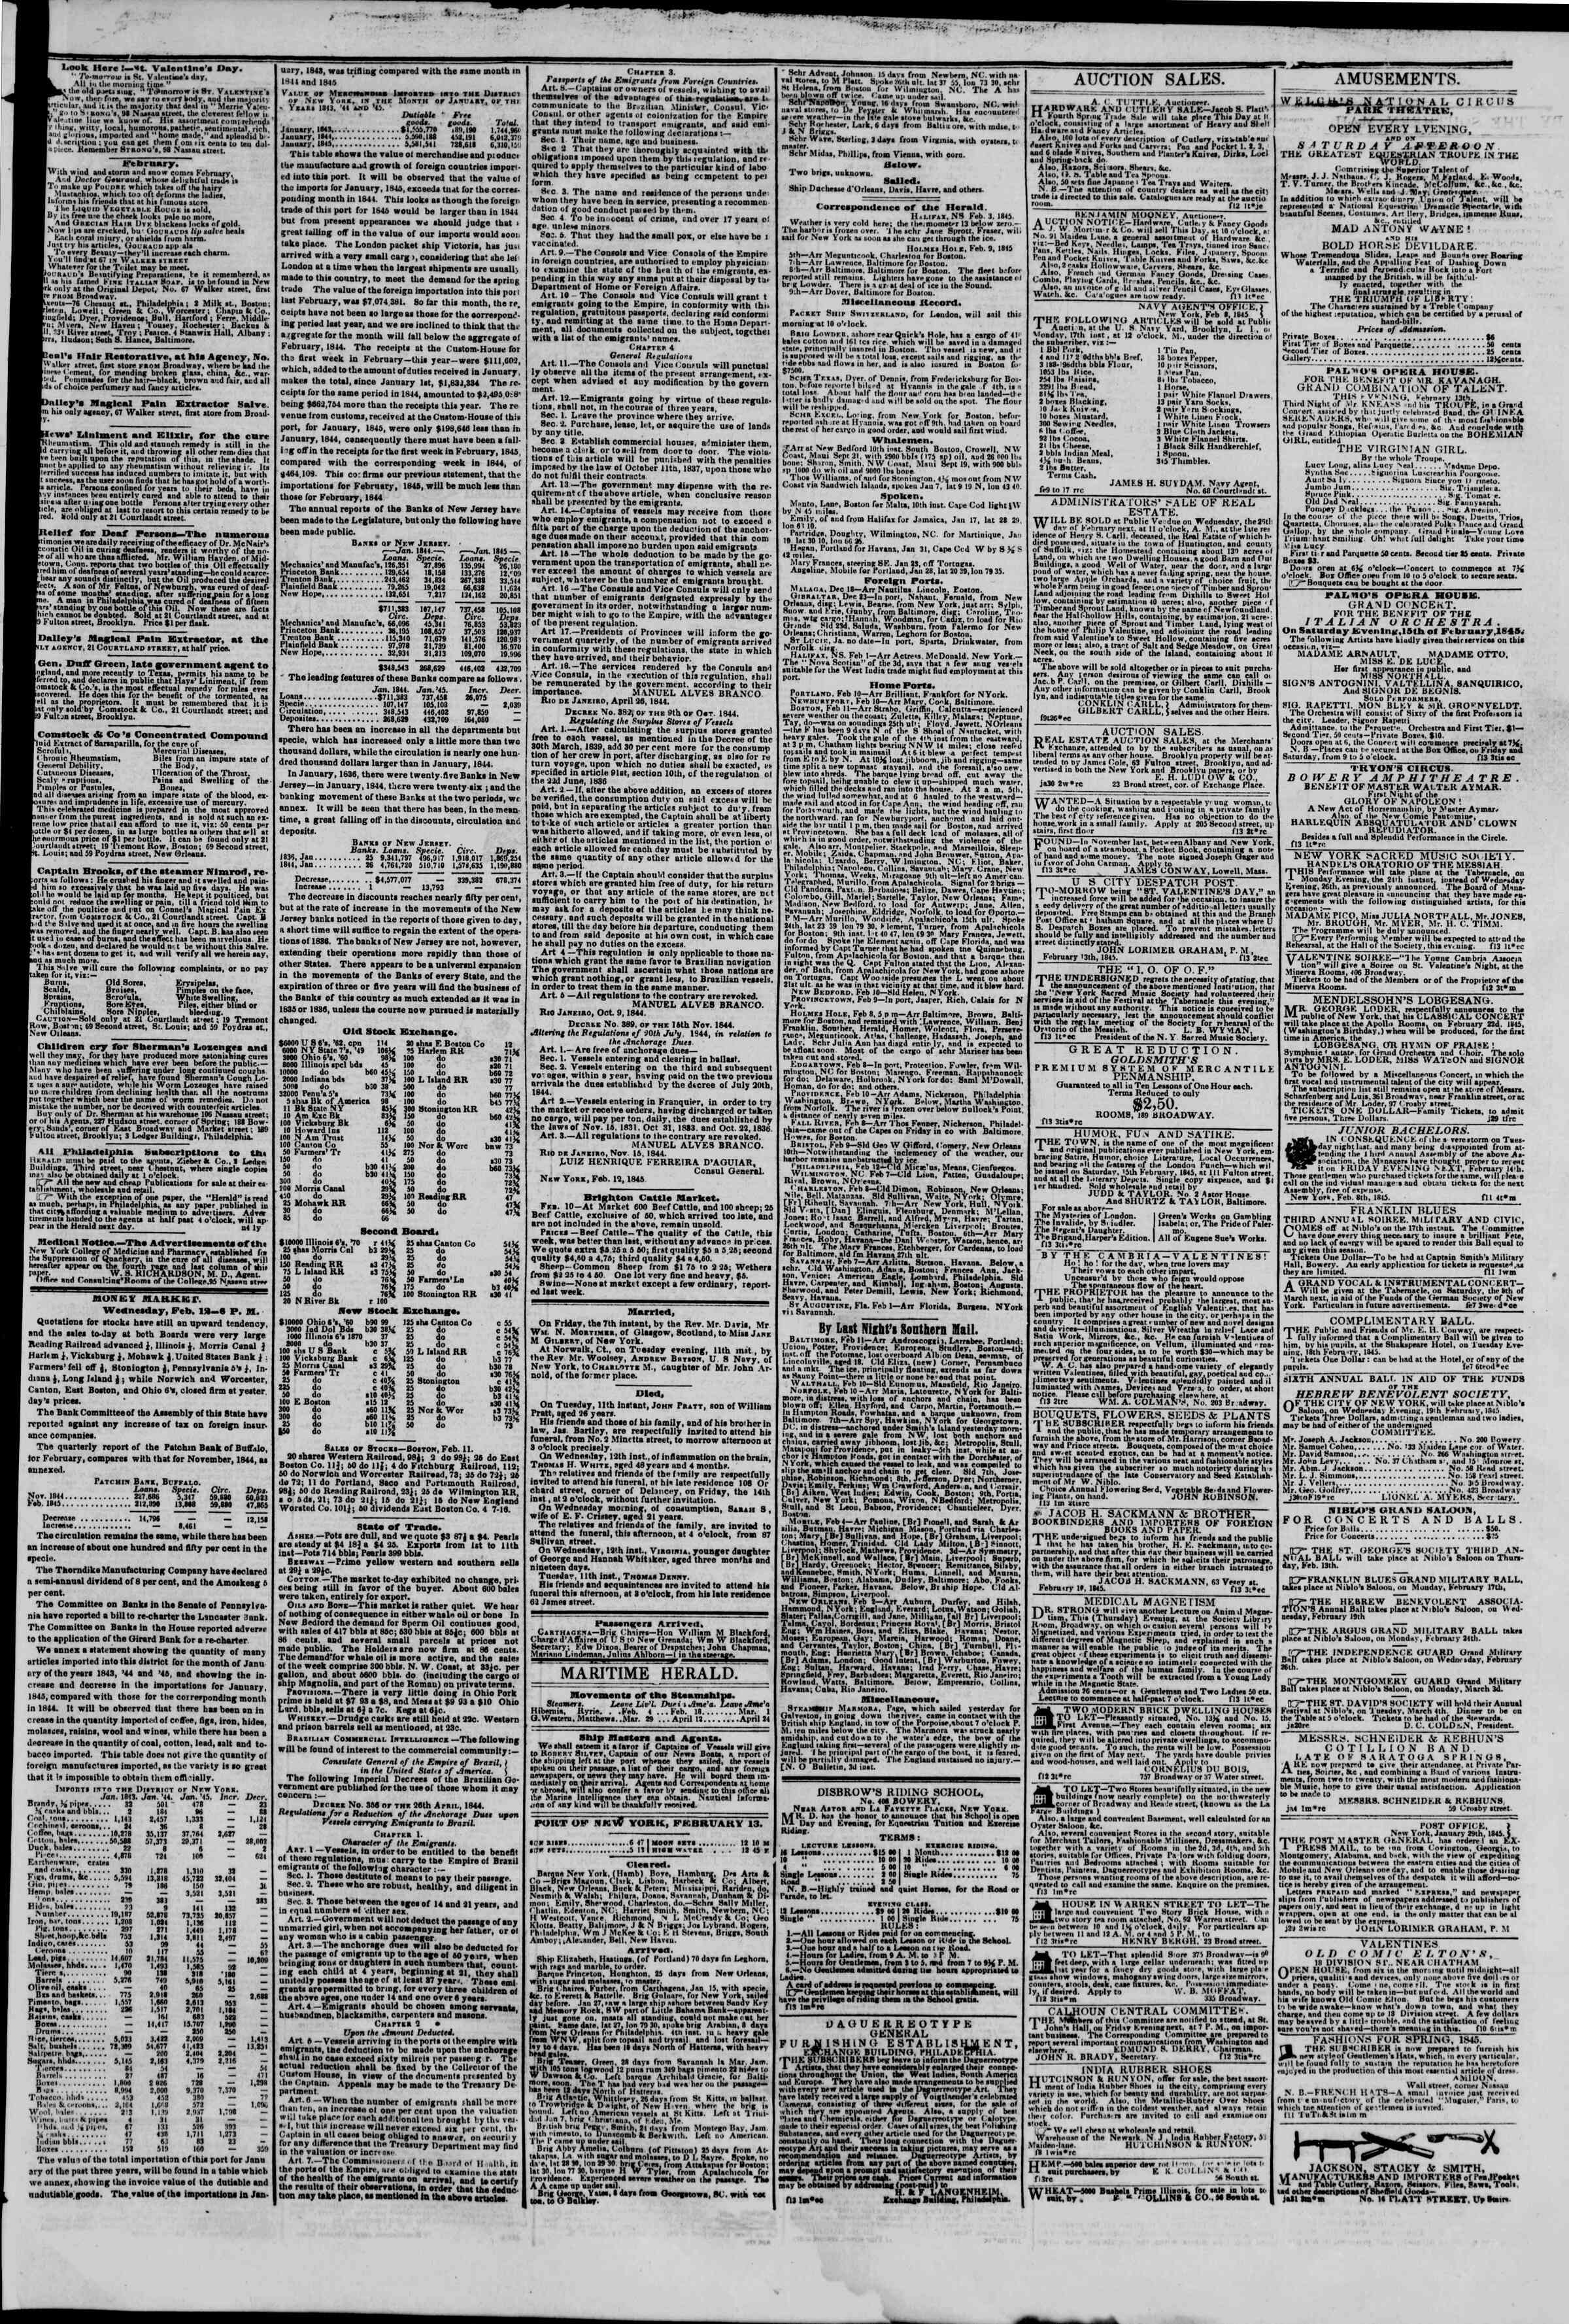 February 13, 1845 Tarihli The New York Herald Gazetesi Sayfa 3